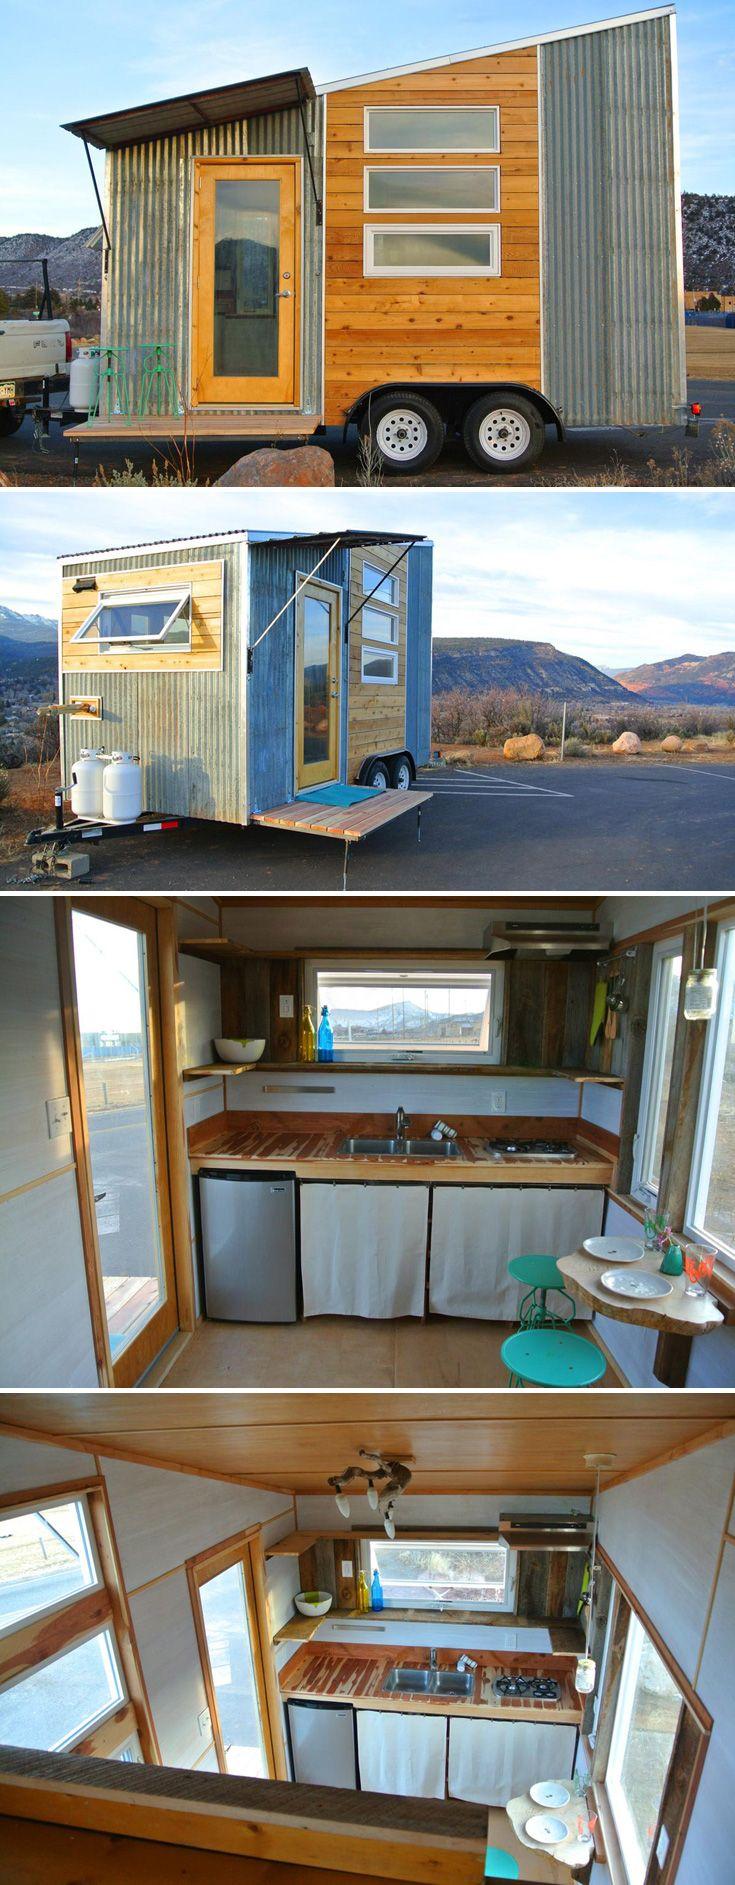 A lightweight, aerodynamic 120 sq.ft. tiny house on a 7.5' x 16' trailer.